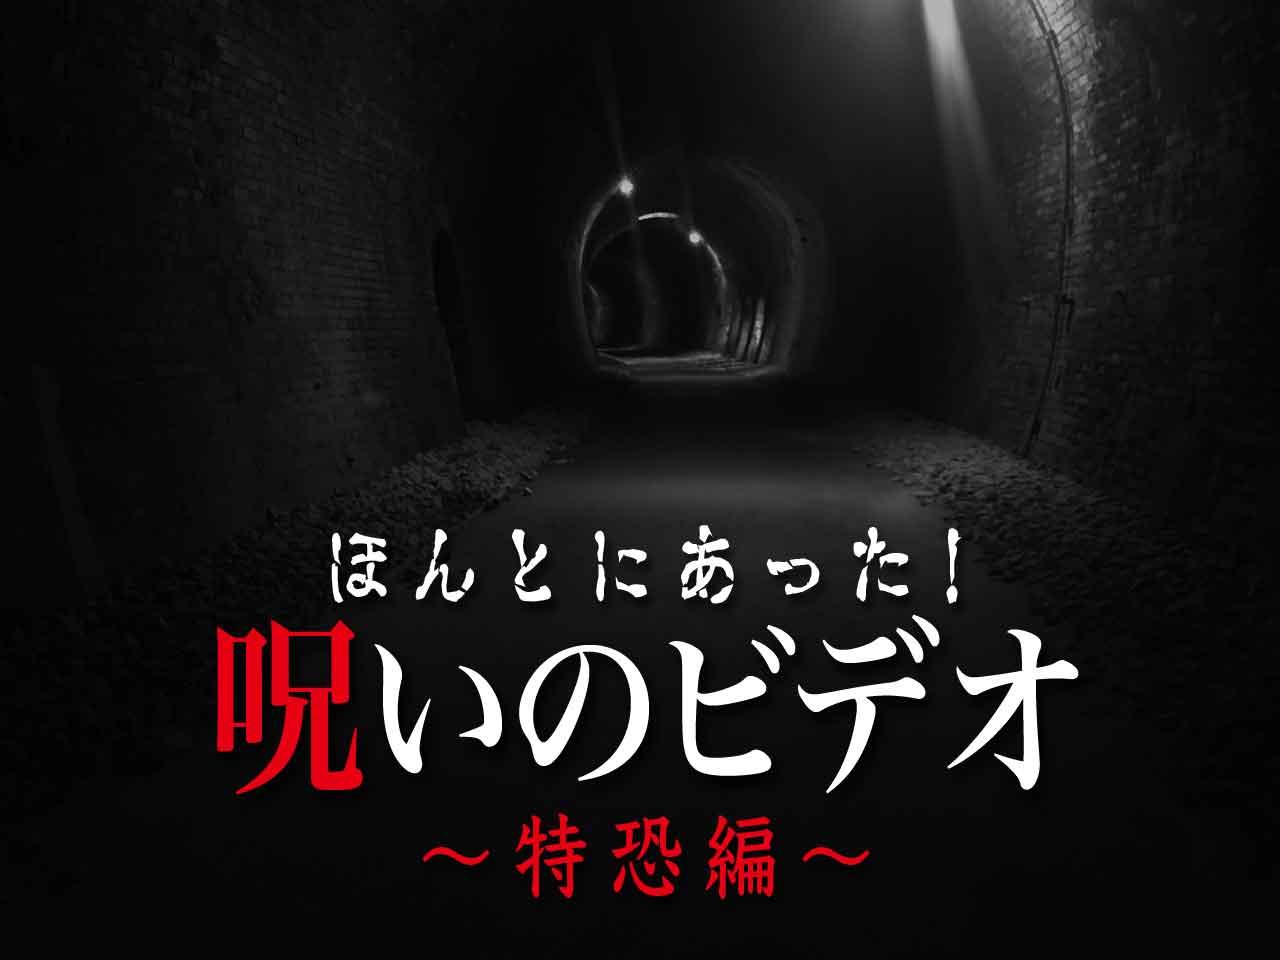 eye_catch_noro_tokukyo